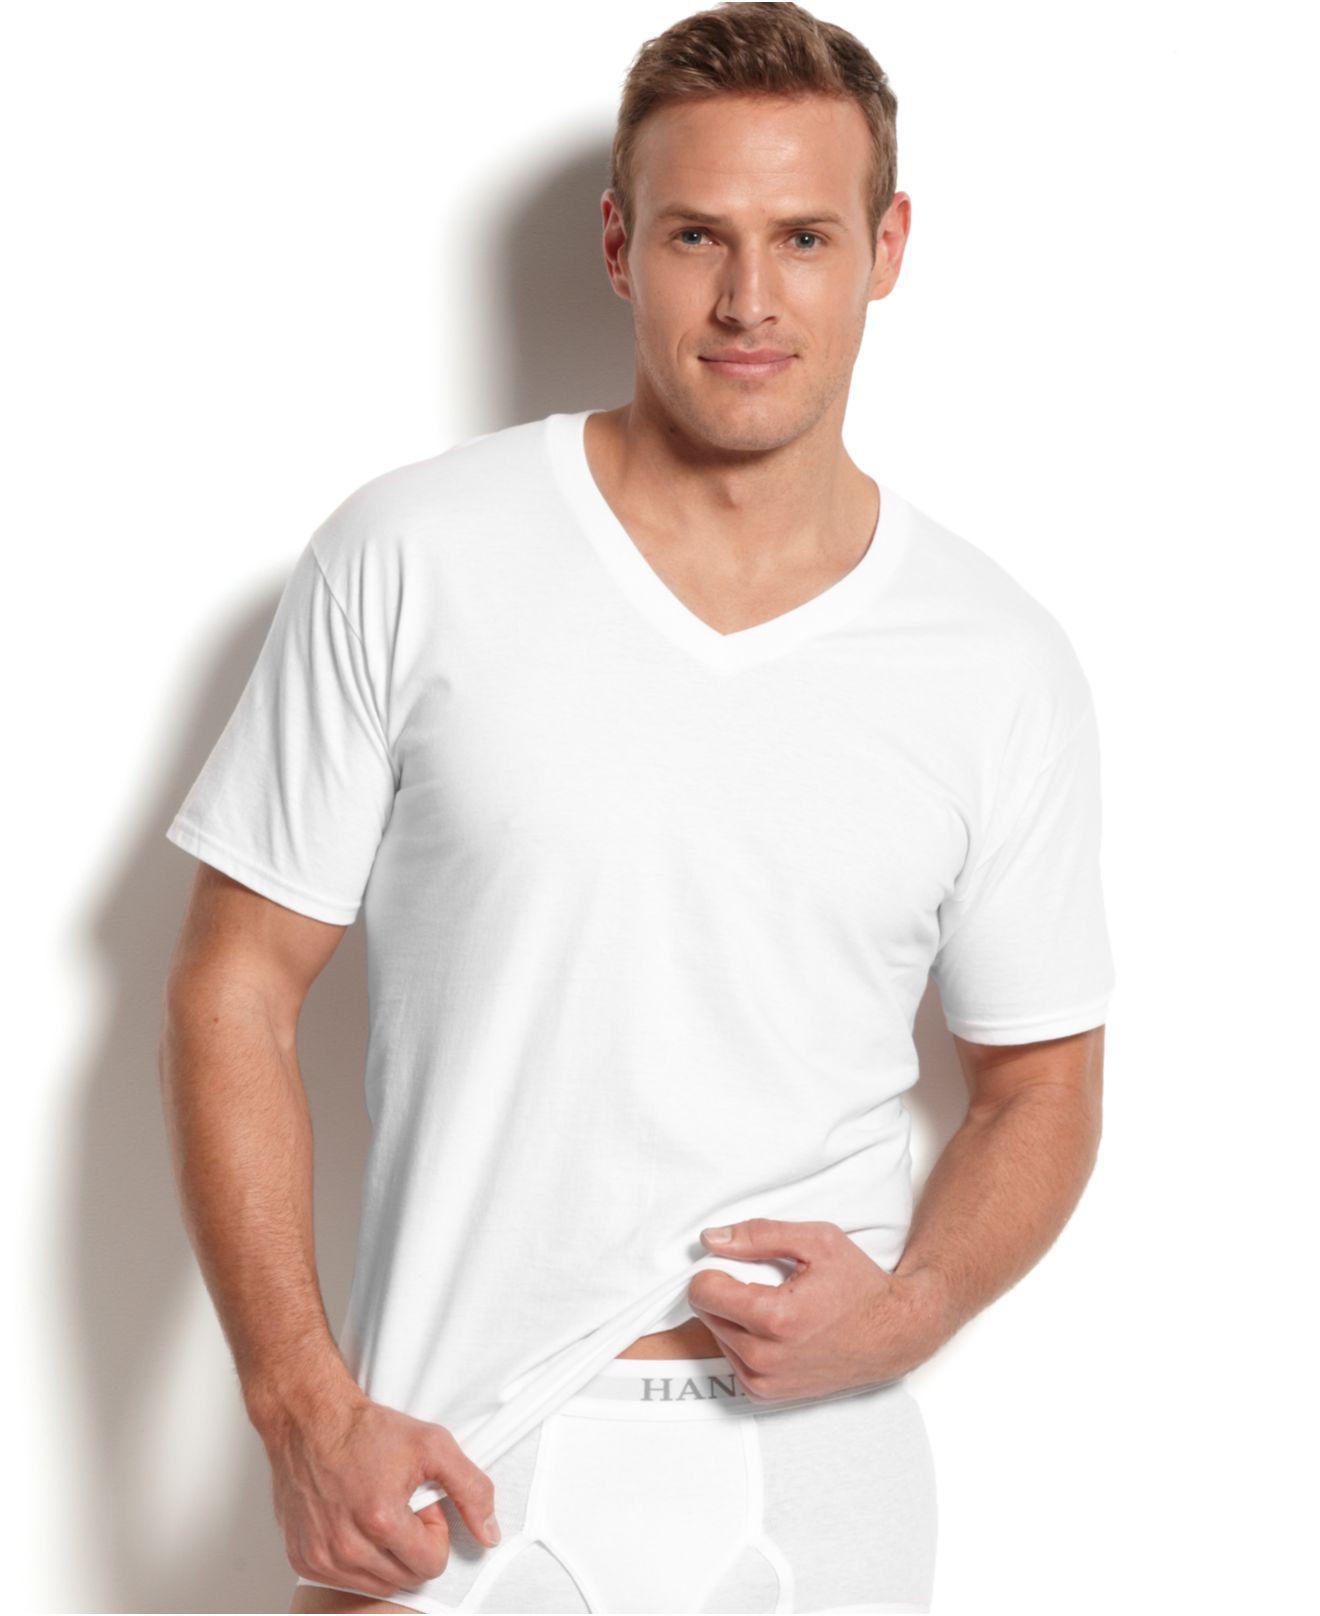 ba8e8af1 Hanes. Men's White Platinum Freshiqtm Underwear,5 Pack V-neck Undershirts